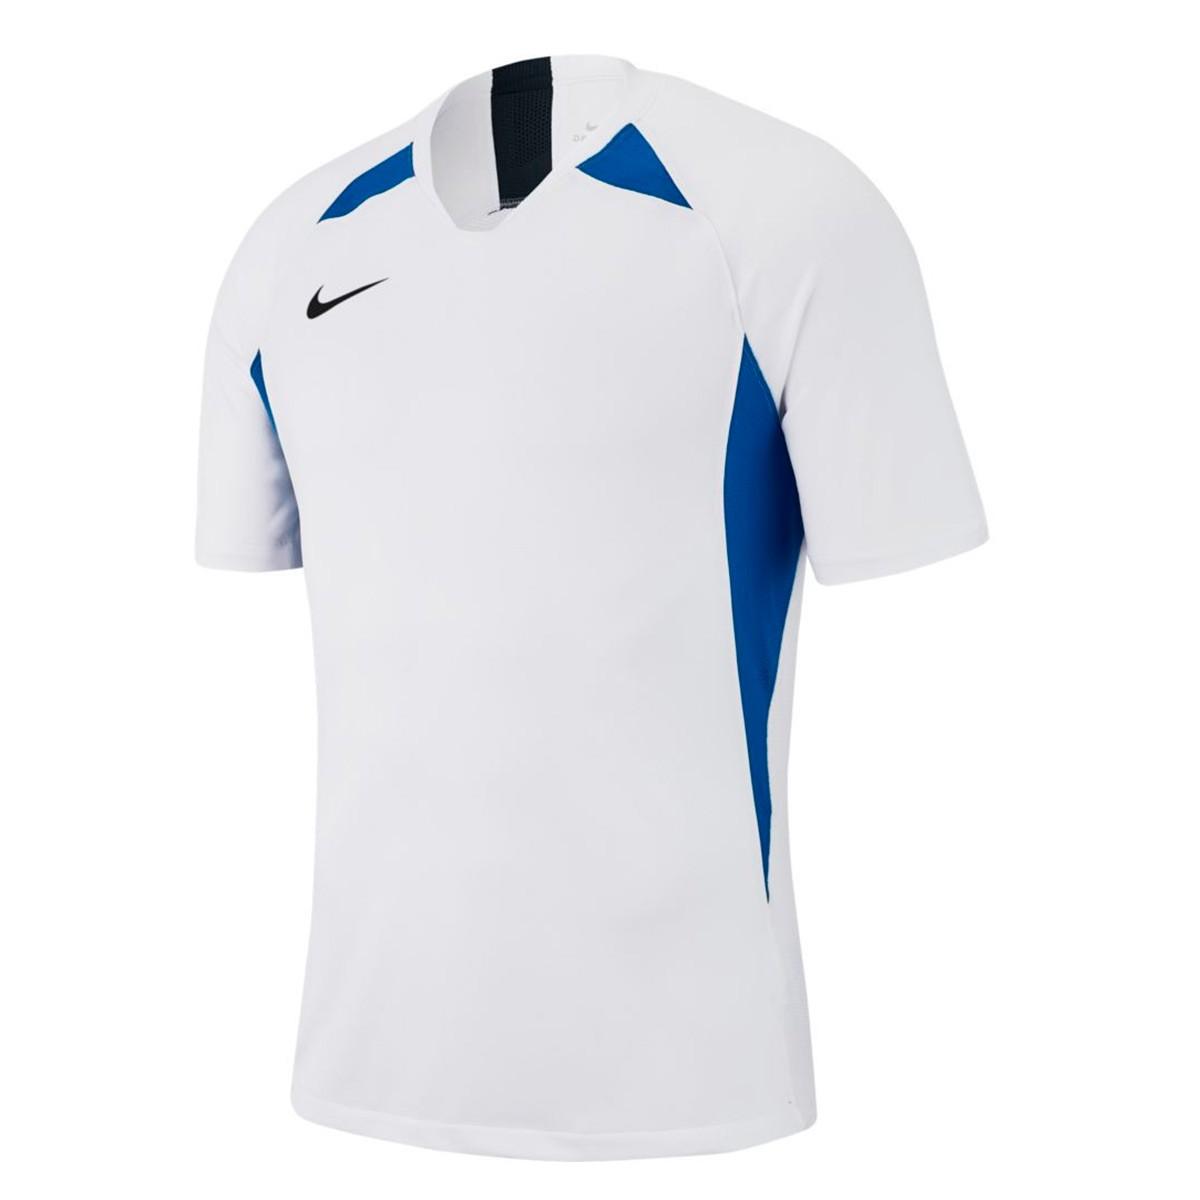 6fcb2fff3225 Jersey Nike Kids Legend m c White-Royal blue - Football store Fútbol ...